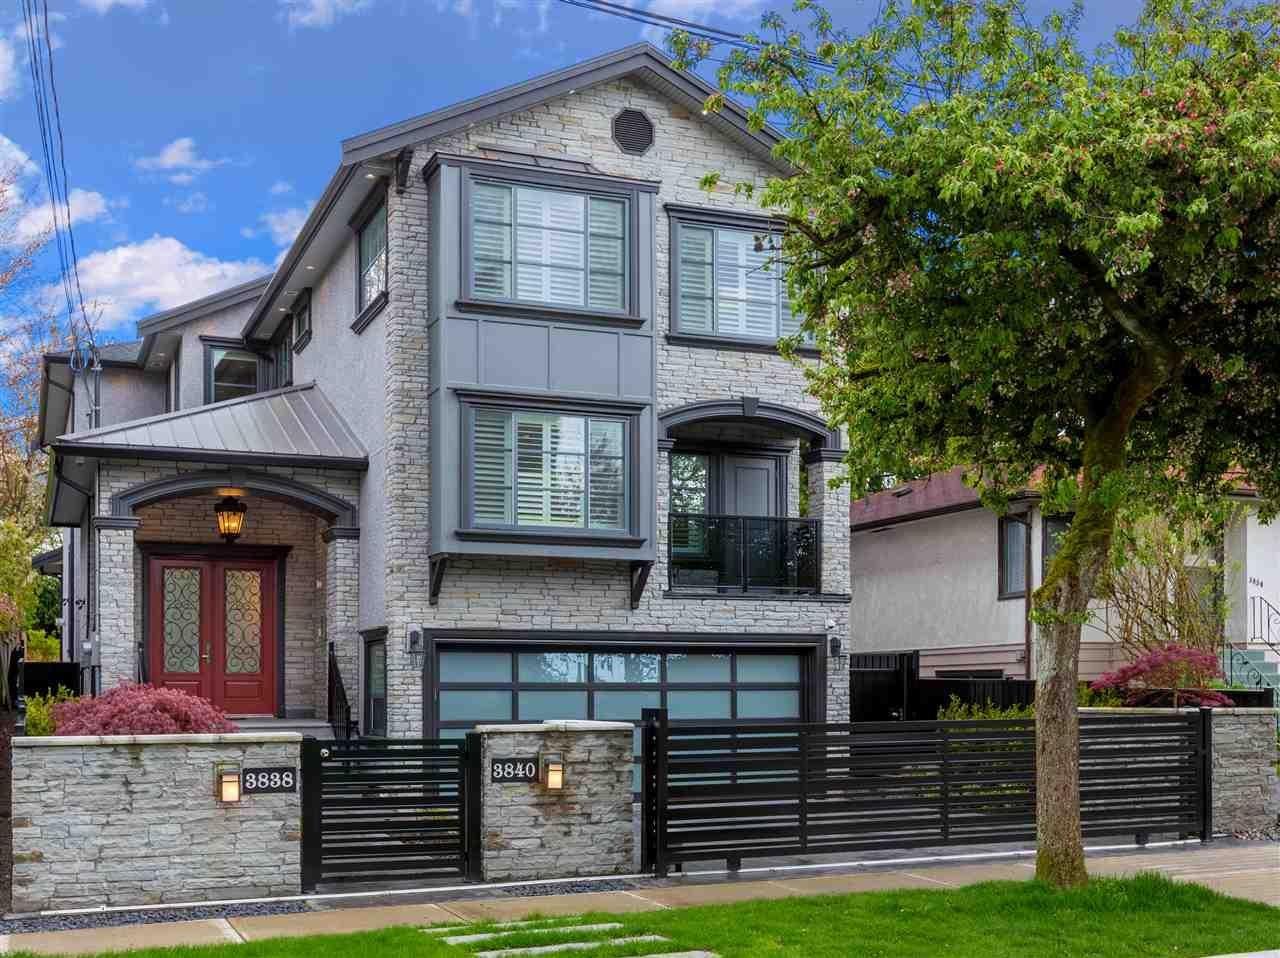 R2163439 - 3838 ONTARIO STREET, Main, Vancouver, BC - House/Single Family